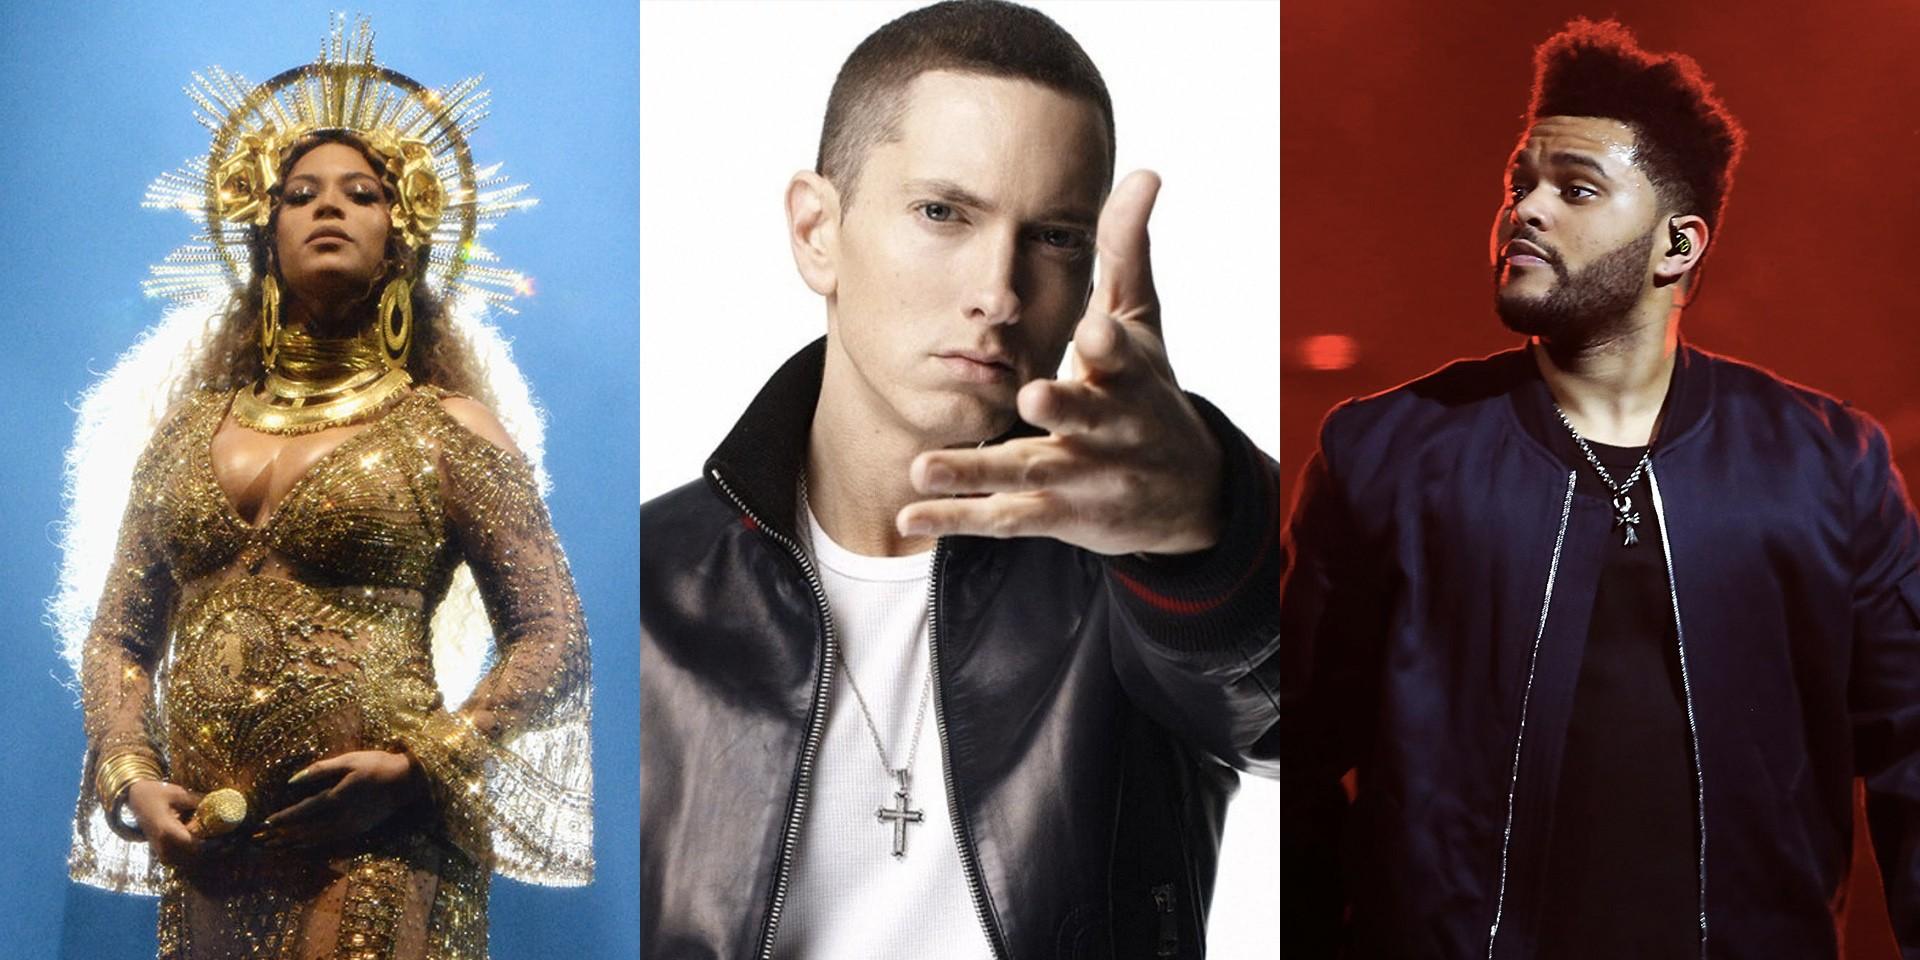 Coachella 2018 line-up: Beyoncé, The Weeknd, Eminem to headline